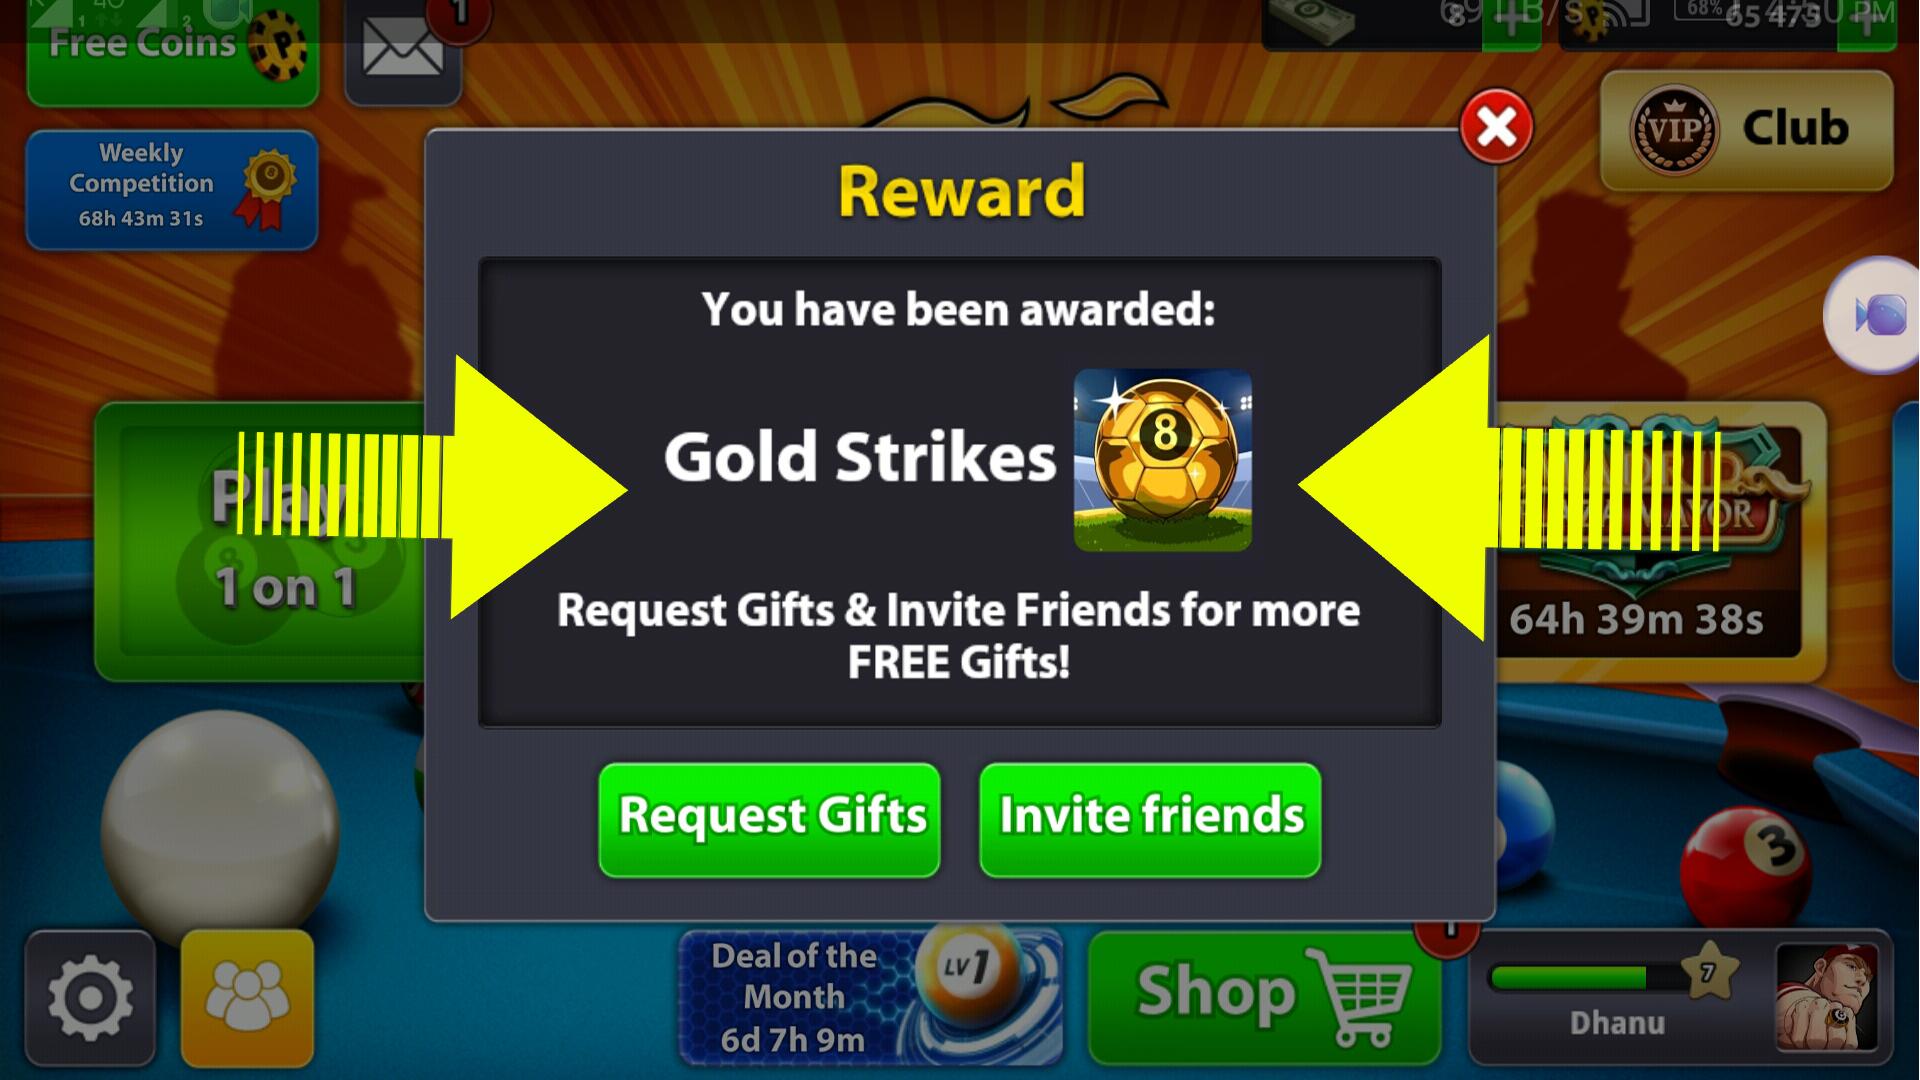 8 Ball Pool - Free Coins + New Soccer Avatar Tricks Links ...